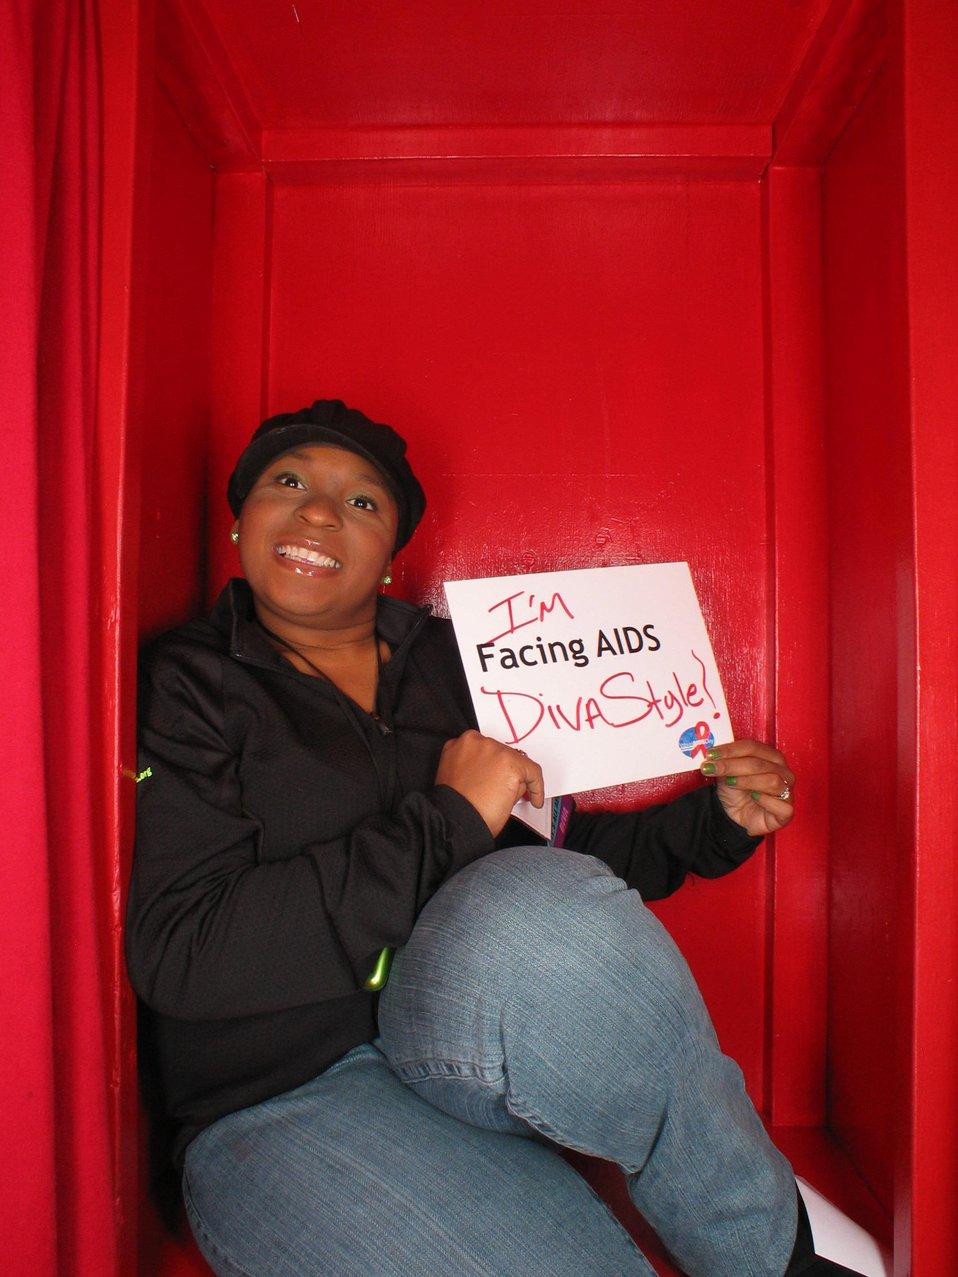 I'm Facing AIDS Diva Style!